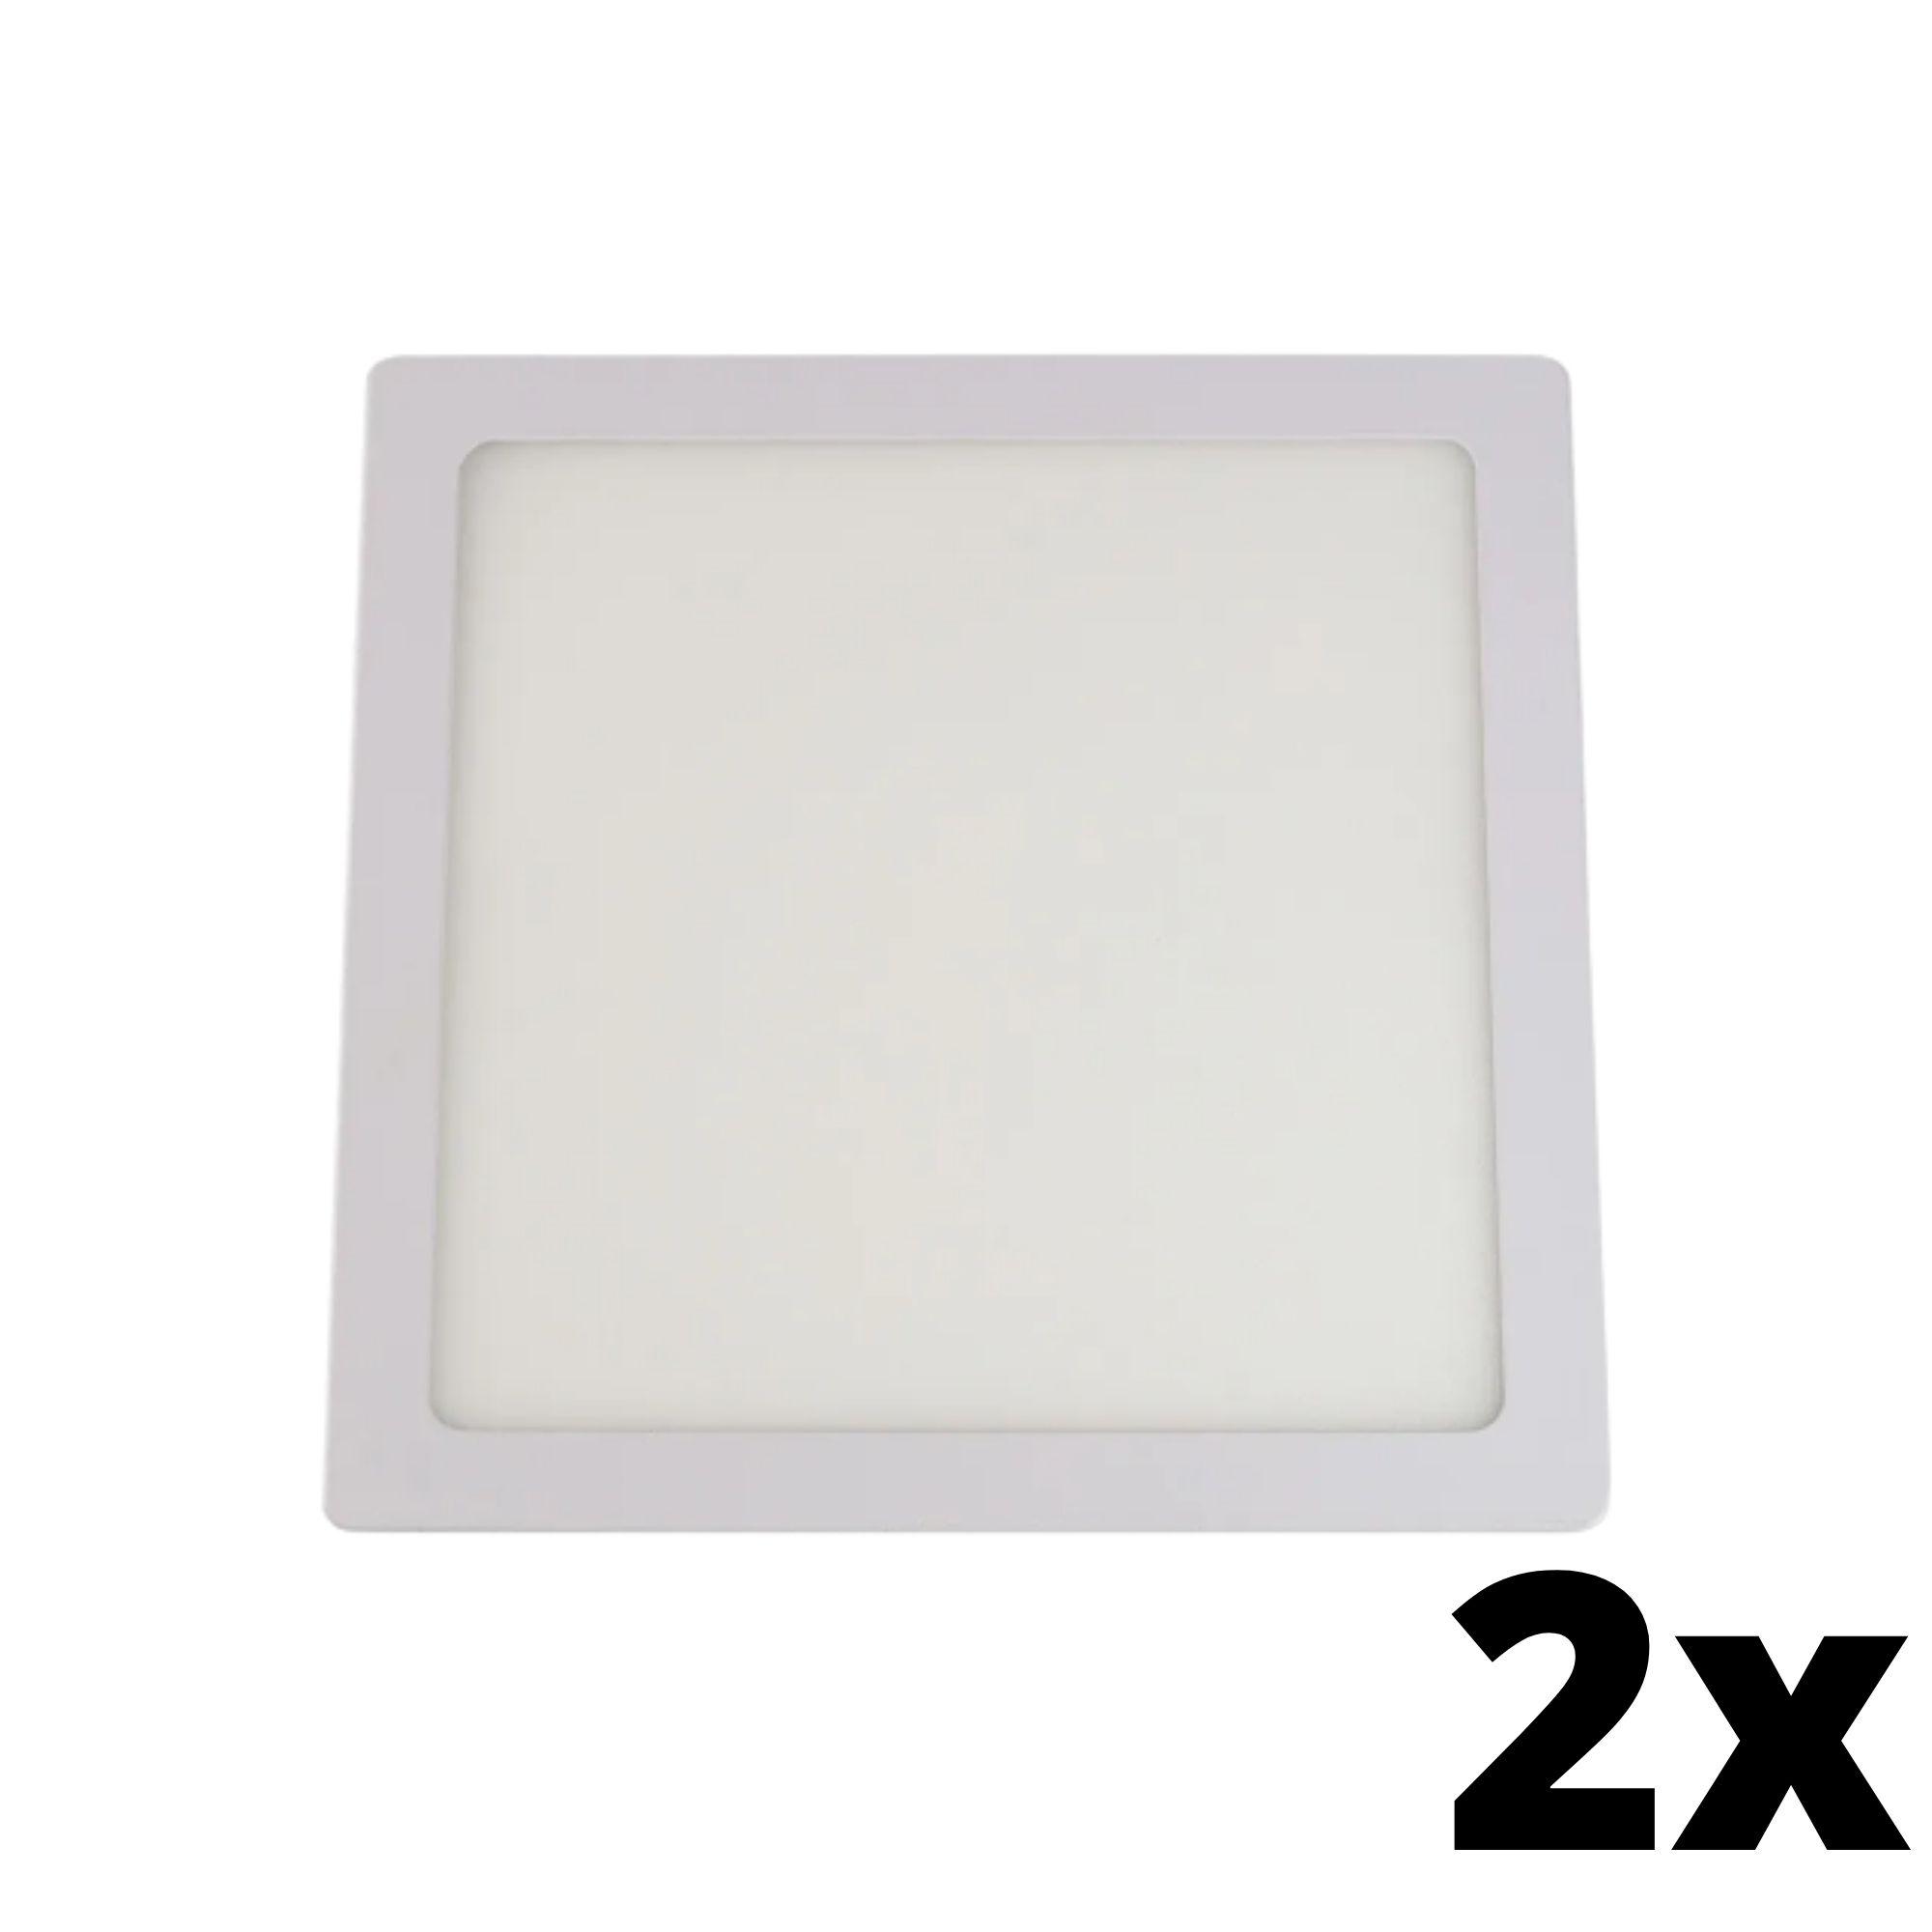 Kit 2 und Painel de Led Embutir 18w Quadrado 6500k